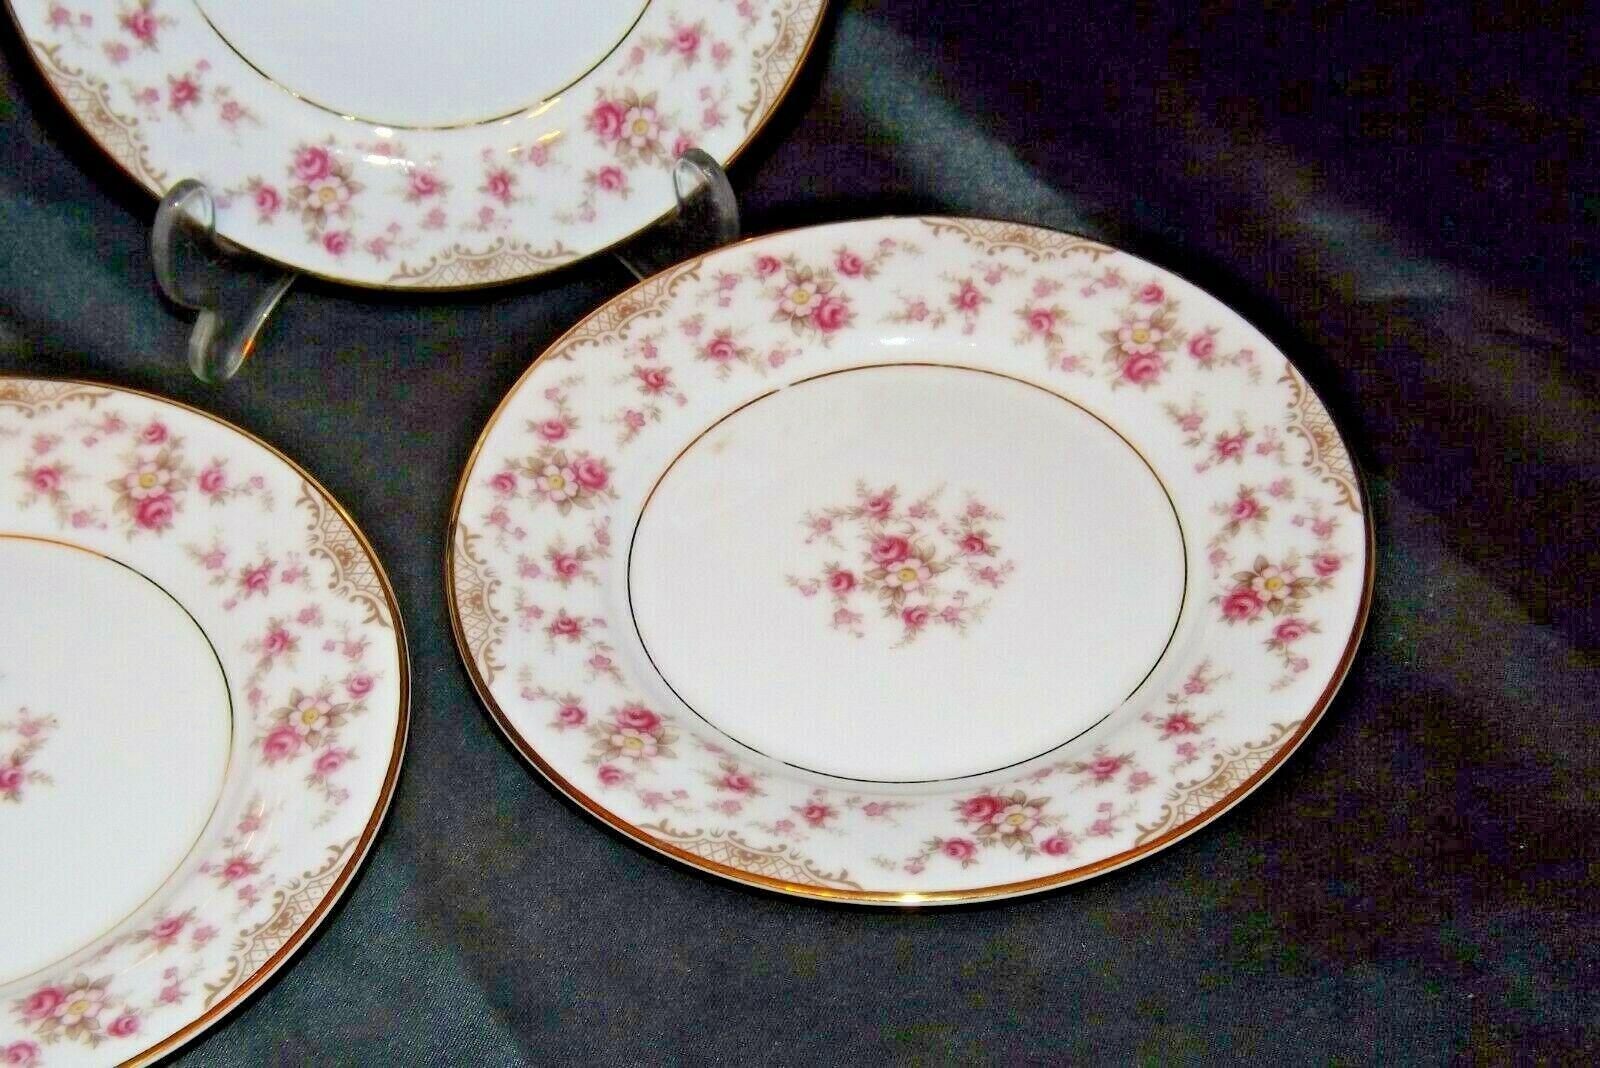 Noritake China (8 – Dessert Plates) Charmaine 5506 AA20-2360C Vintage